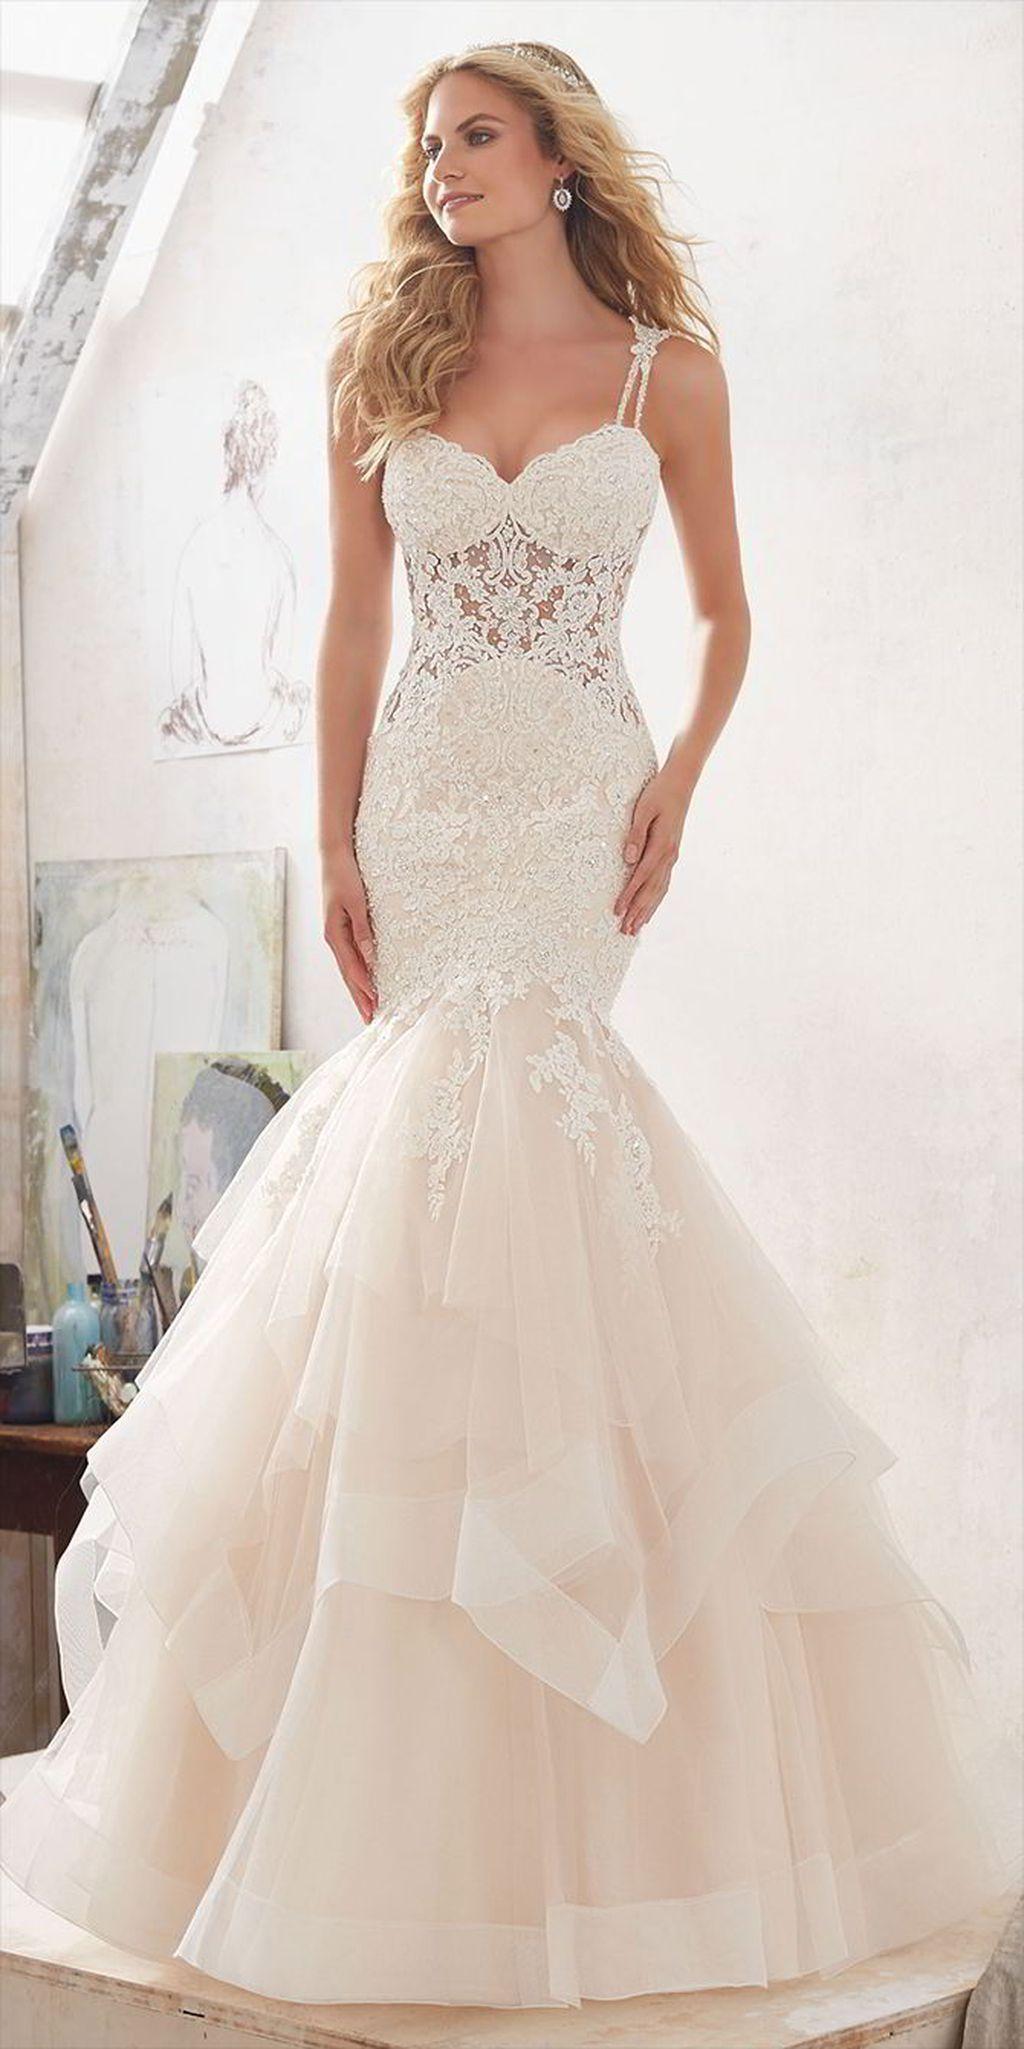 3d0ec0f65d93 99 Beautiful Princess Mermaid Wedding Dress Ideas | Mermaid wedding ...